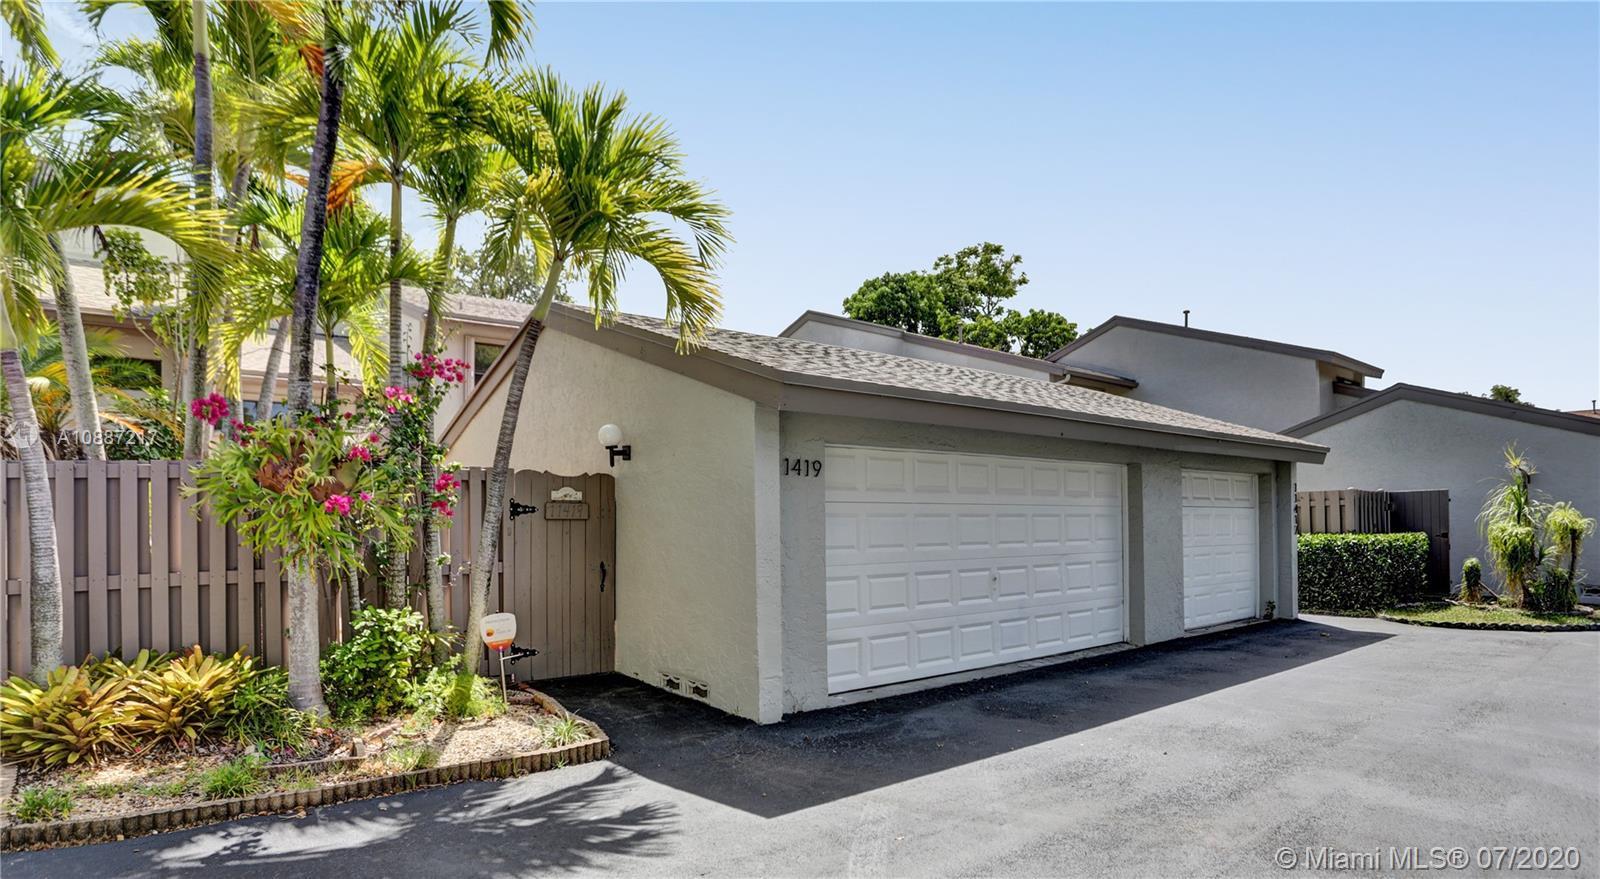 11419 SW 110 Lane # 11419, Miami, Florida 33176, 2 Bedrooms Bedrooms, ,2 BathroomsBathrooms,Residential,For Sale,11419 SW 110 Lane # 11419,A10887217